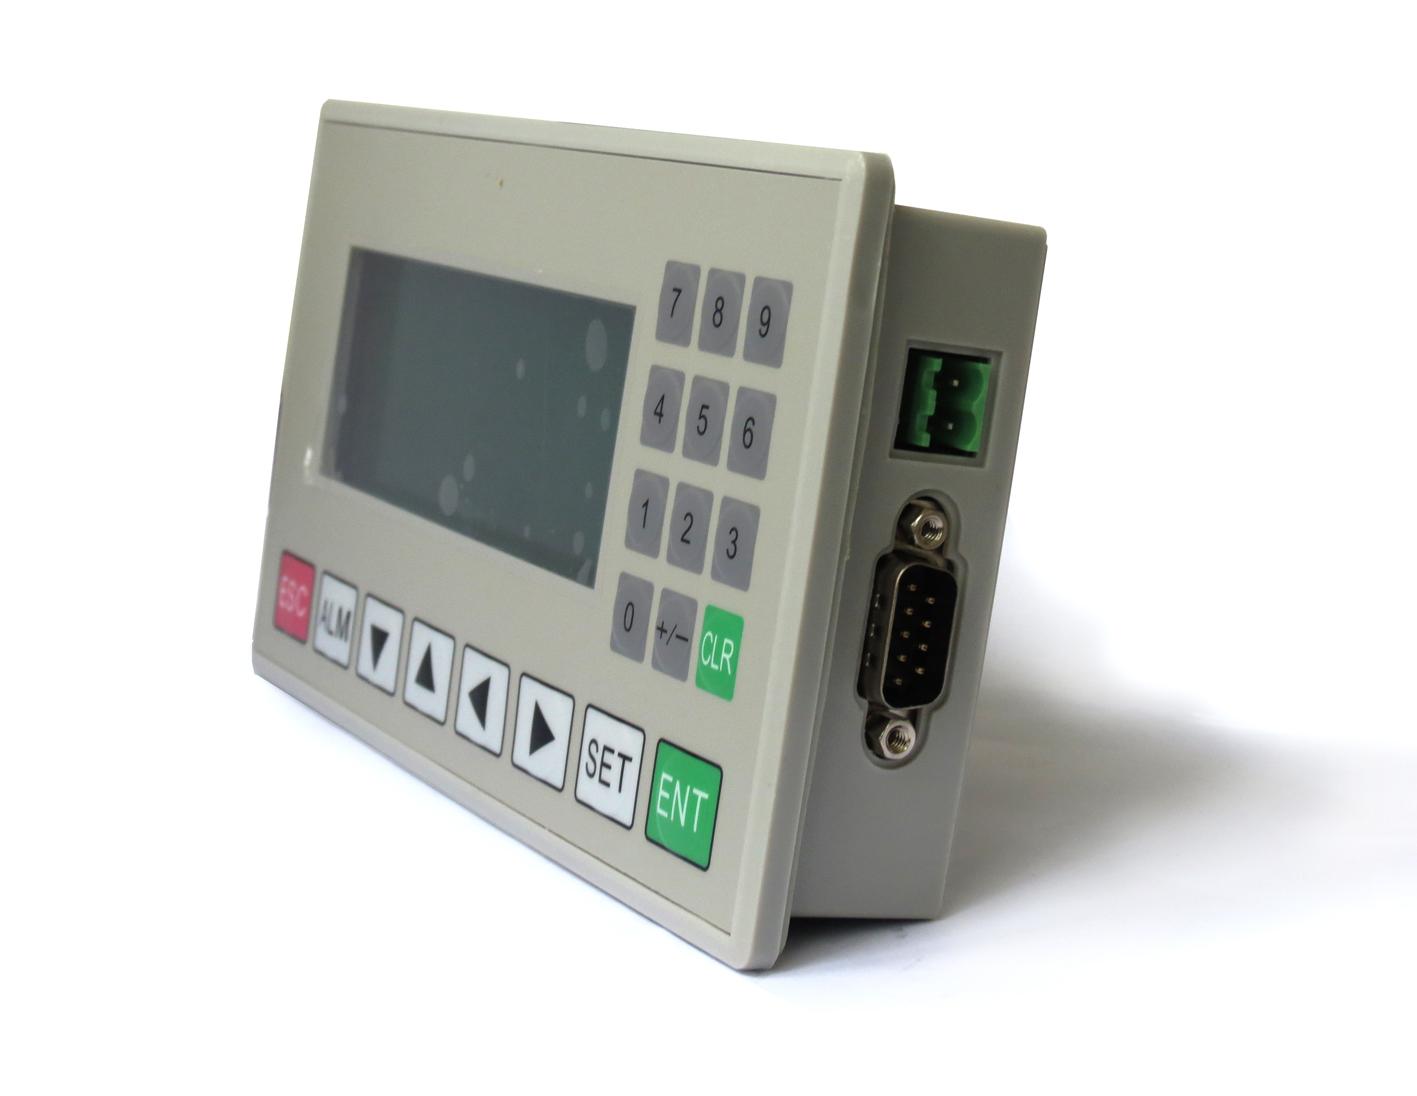 黄石科威  MP1系列一体机产品 MP1C-10M08R/10M08T1/10M04R(04T1)